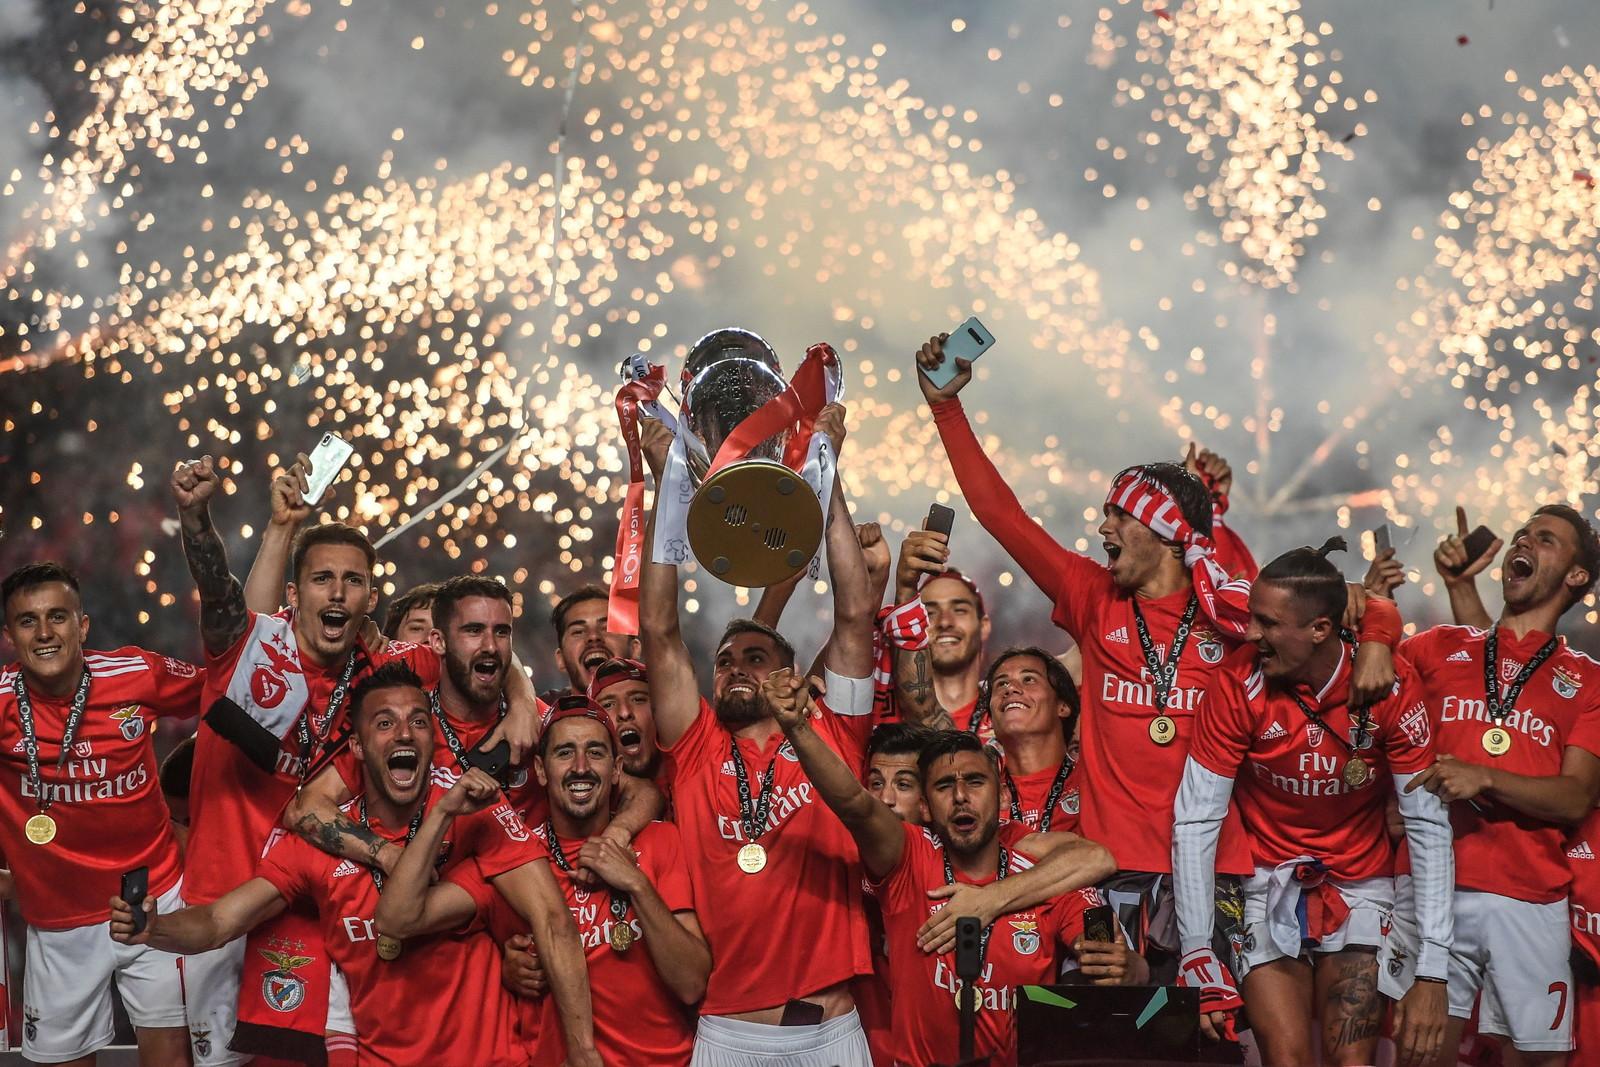 Primeira Liga Portogallo: Benfica